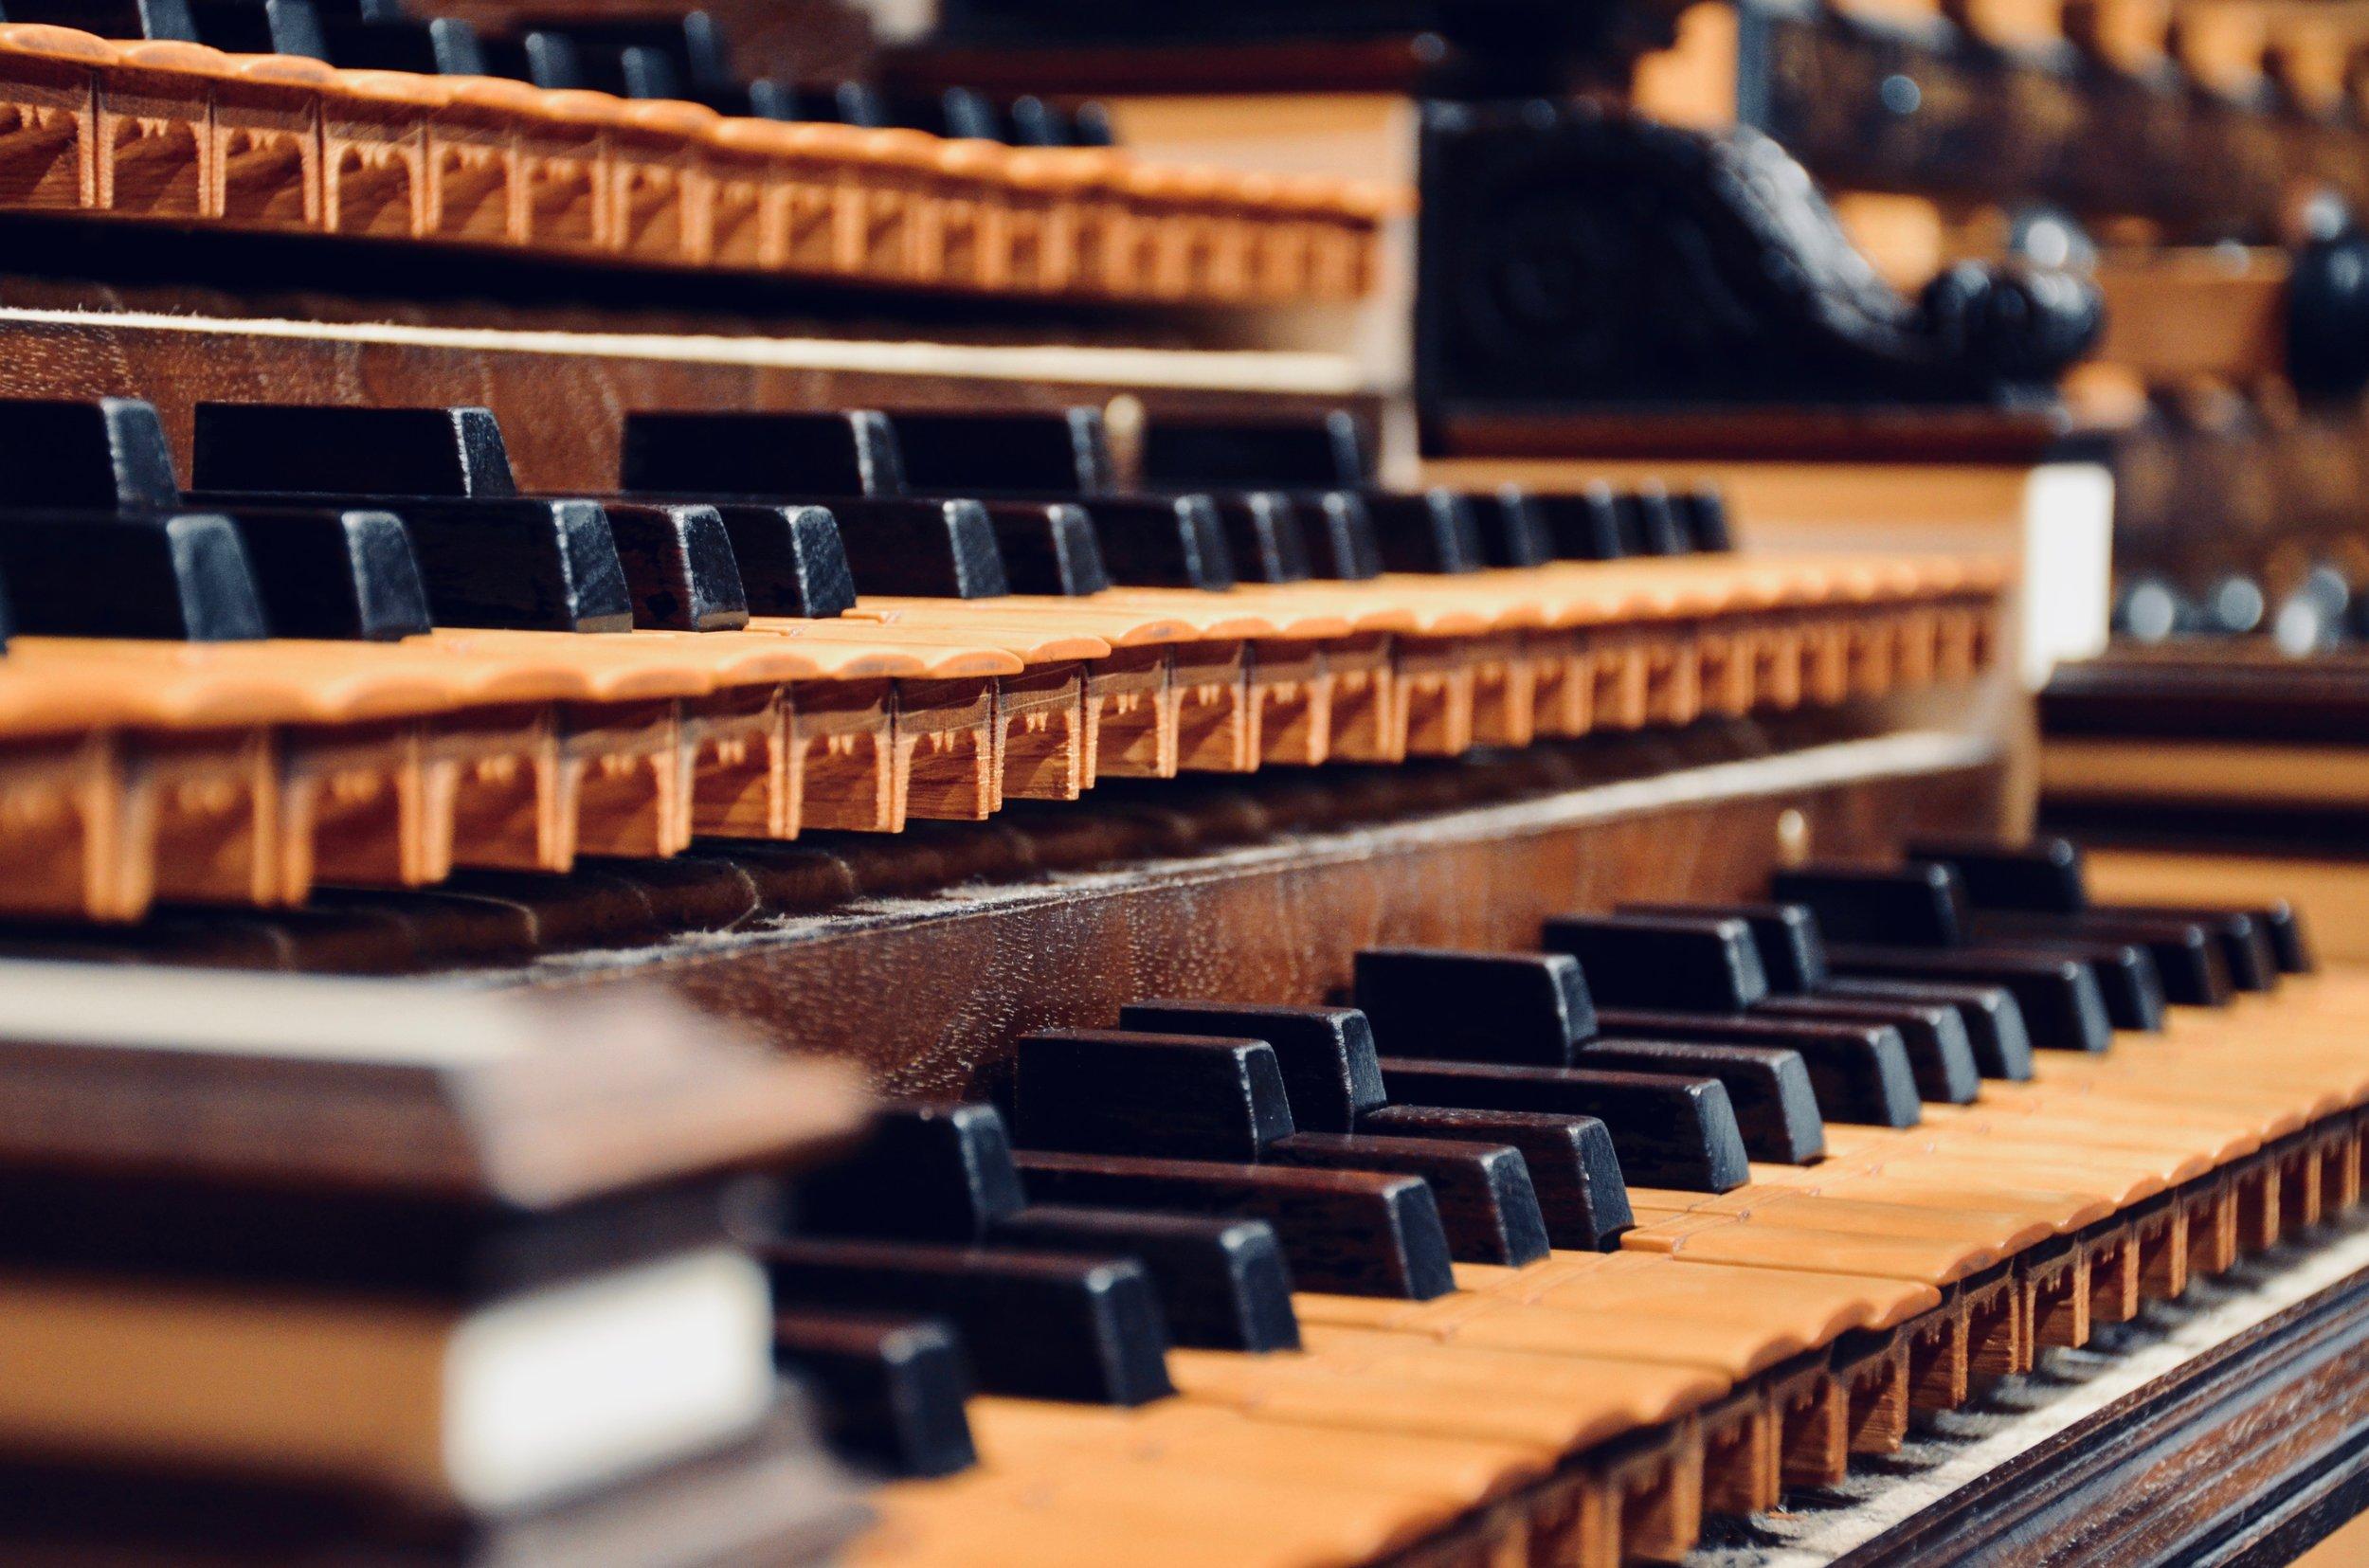 Keydesk detail, with sub-semitones, 2000 North German Baroque organ in Göteborg.